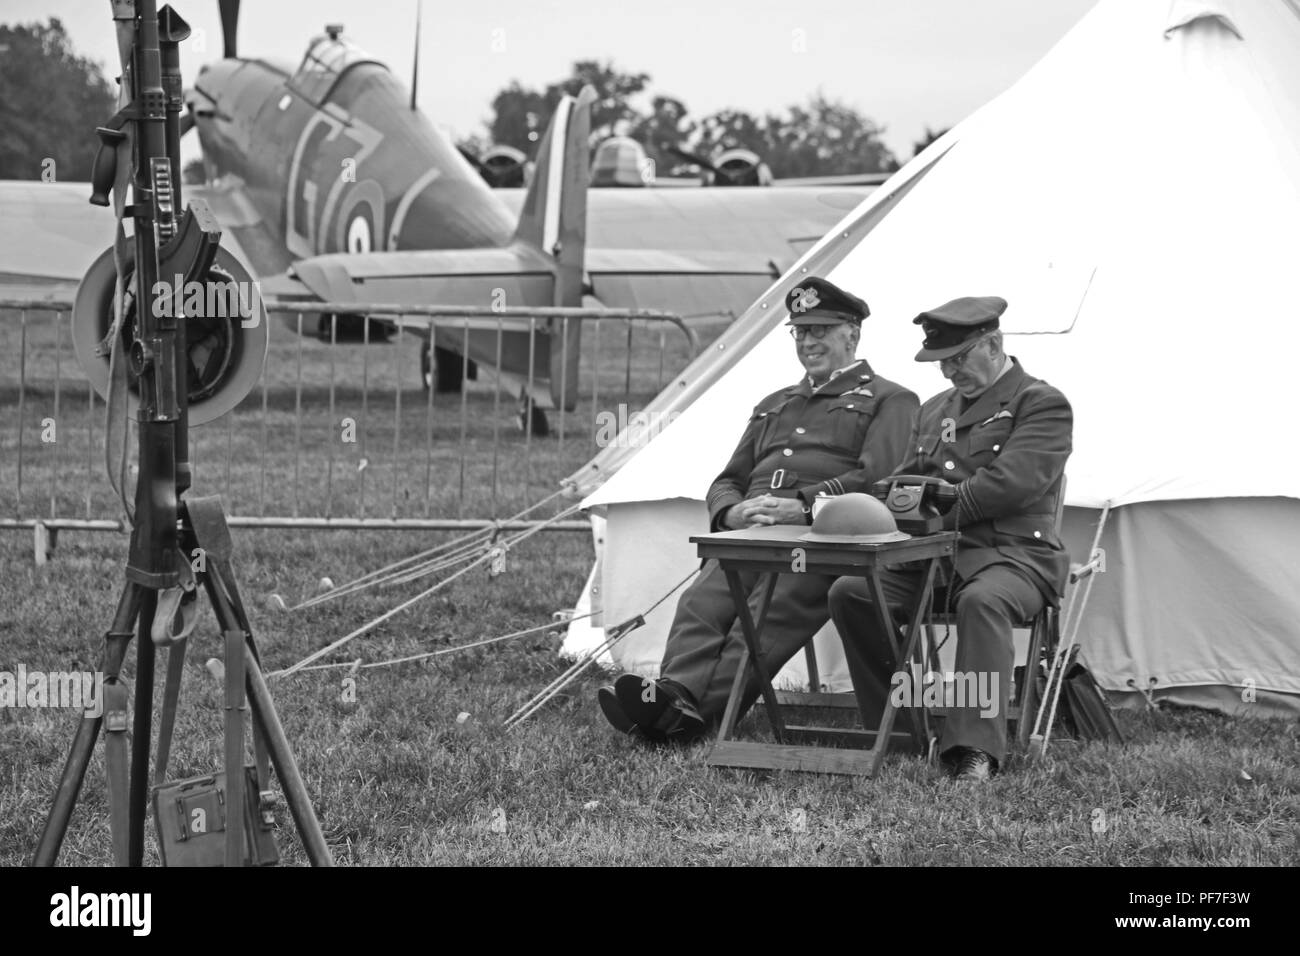 WW2 RAF Airman. - Stock Image